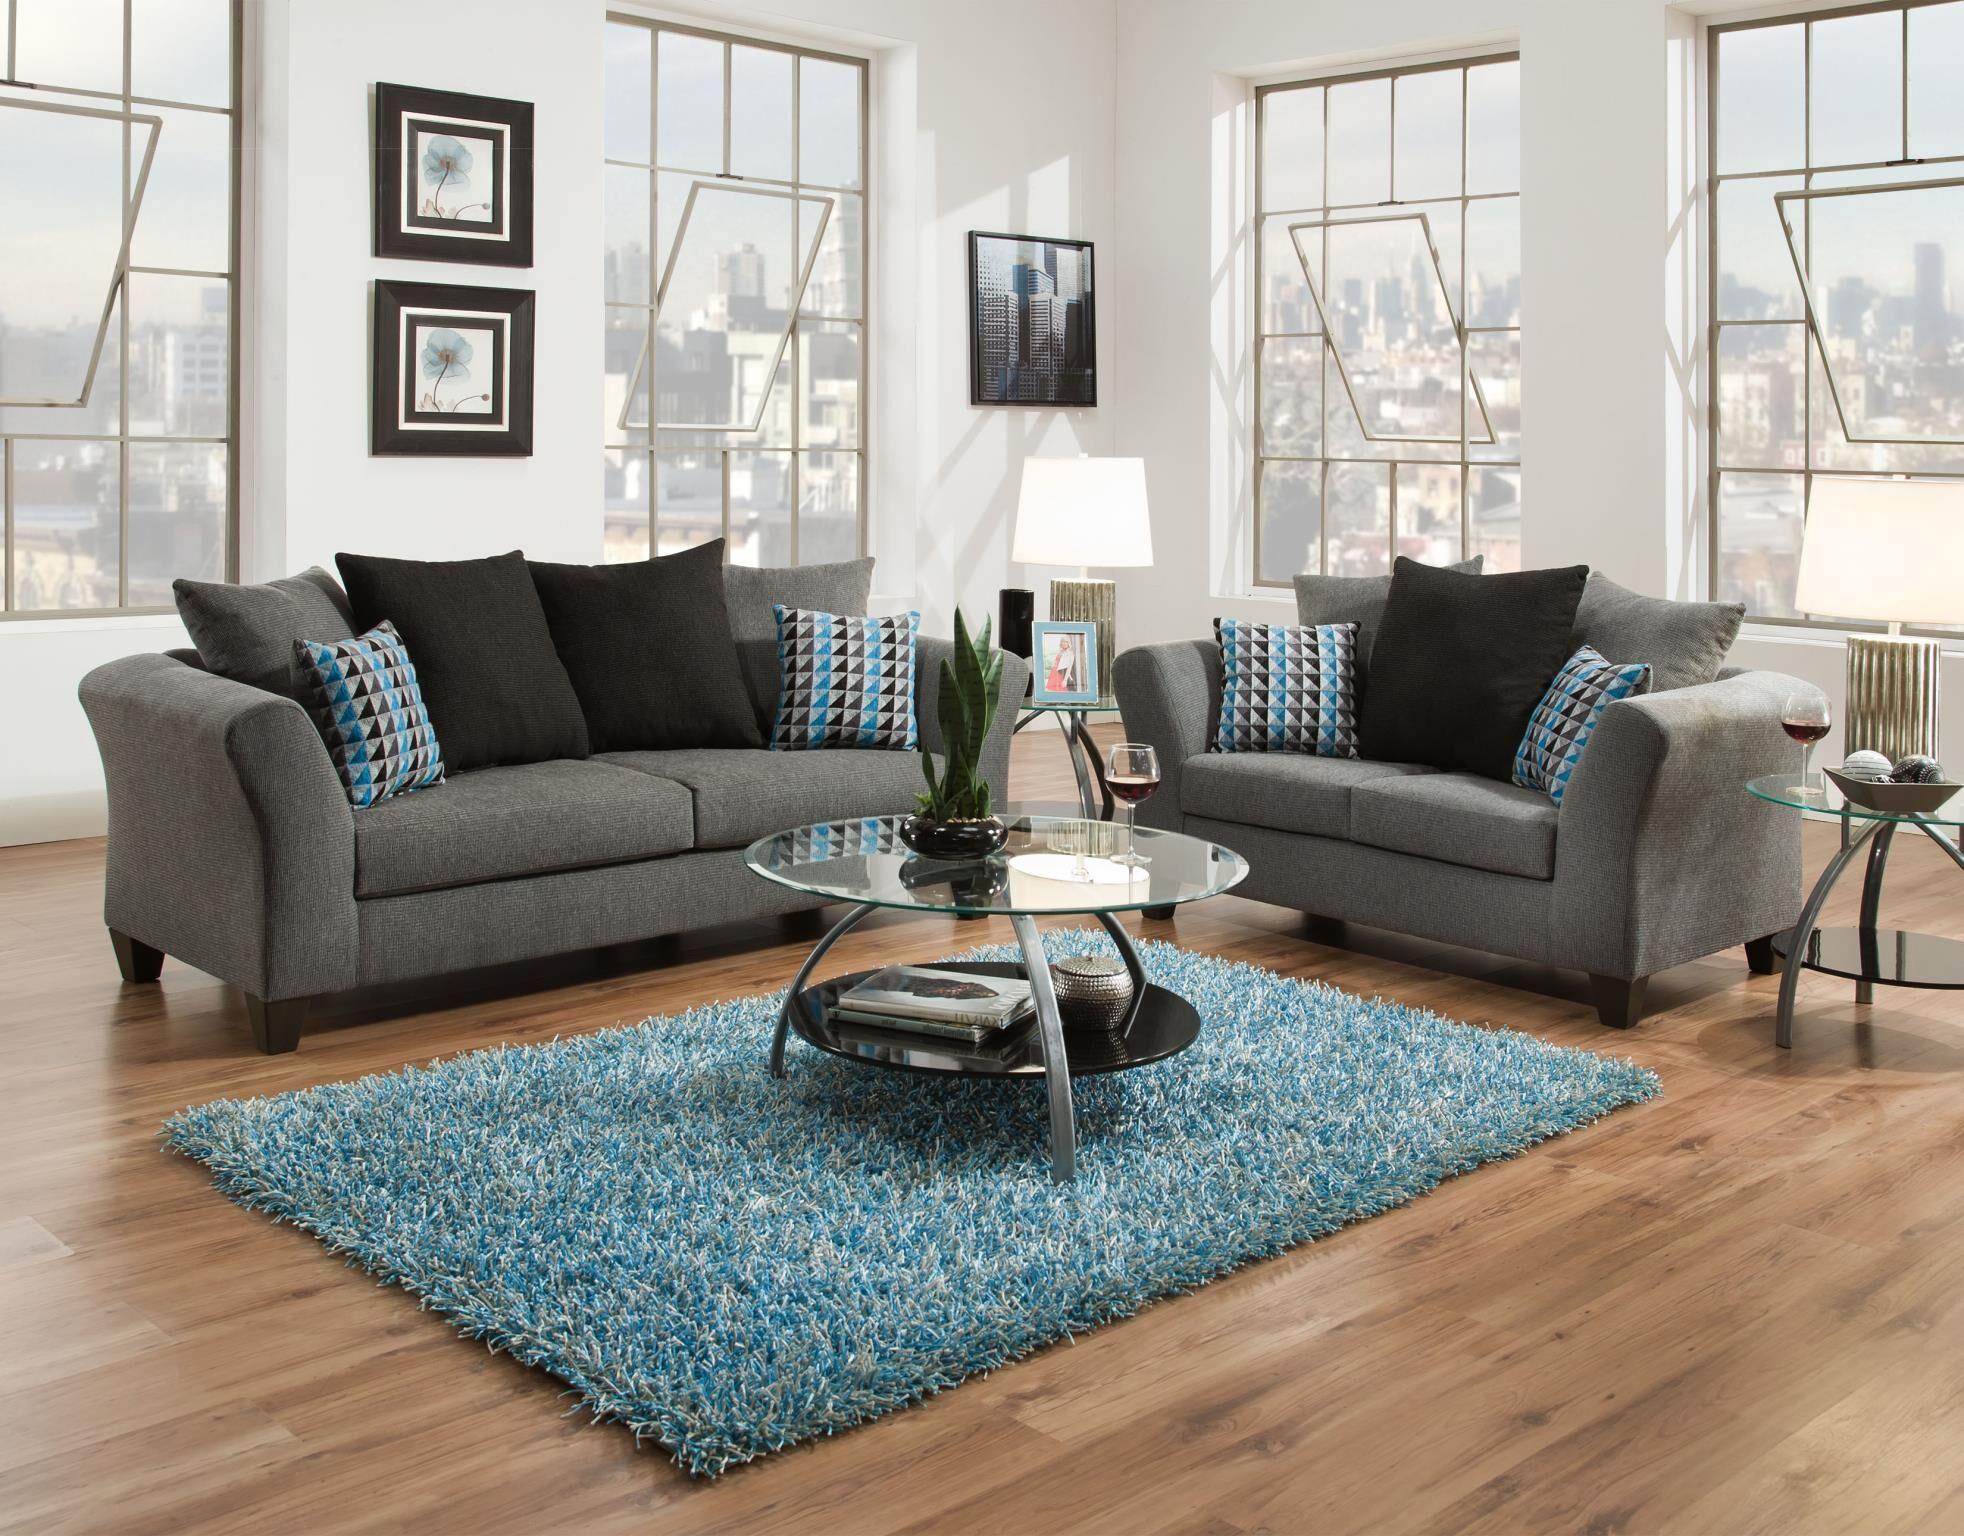 Waterloo 2 Piece Living Room Set Upholstery: Gray